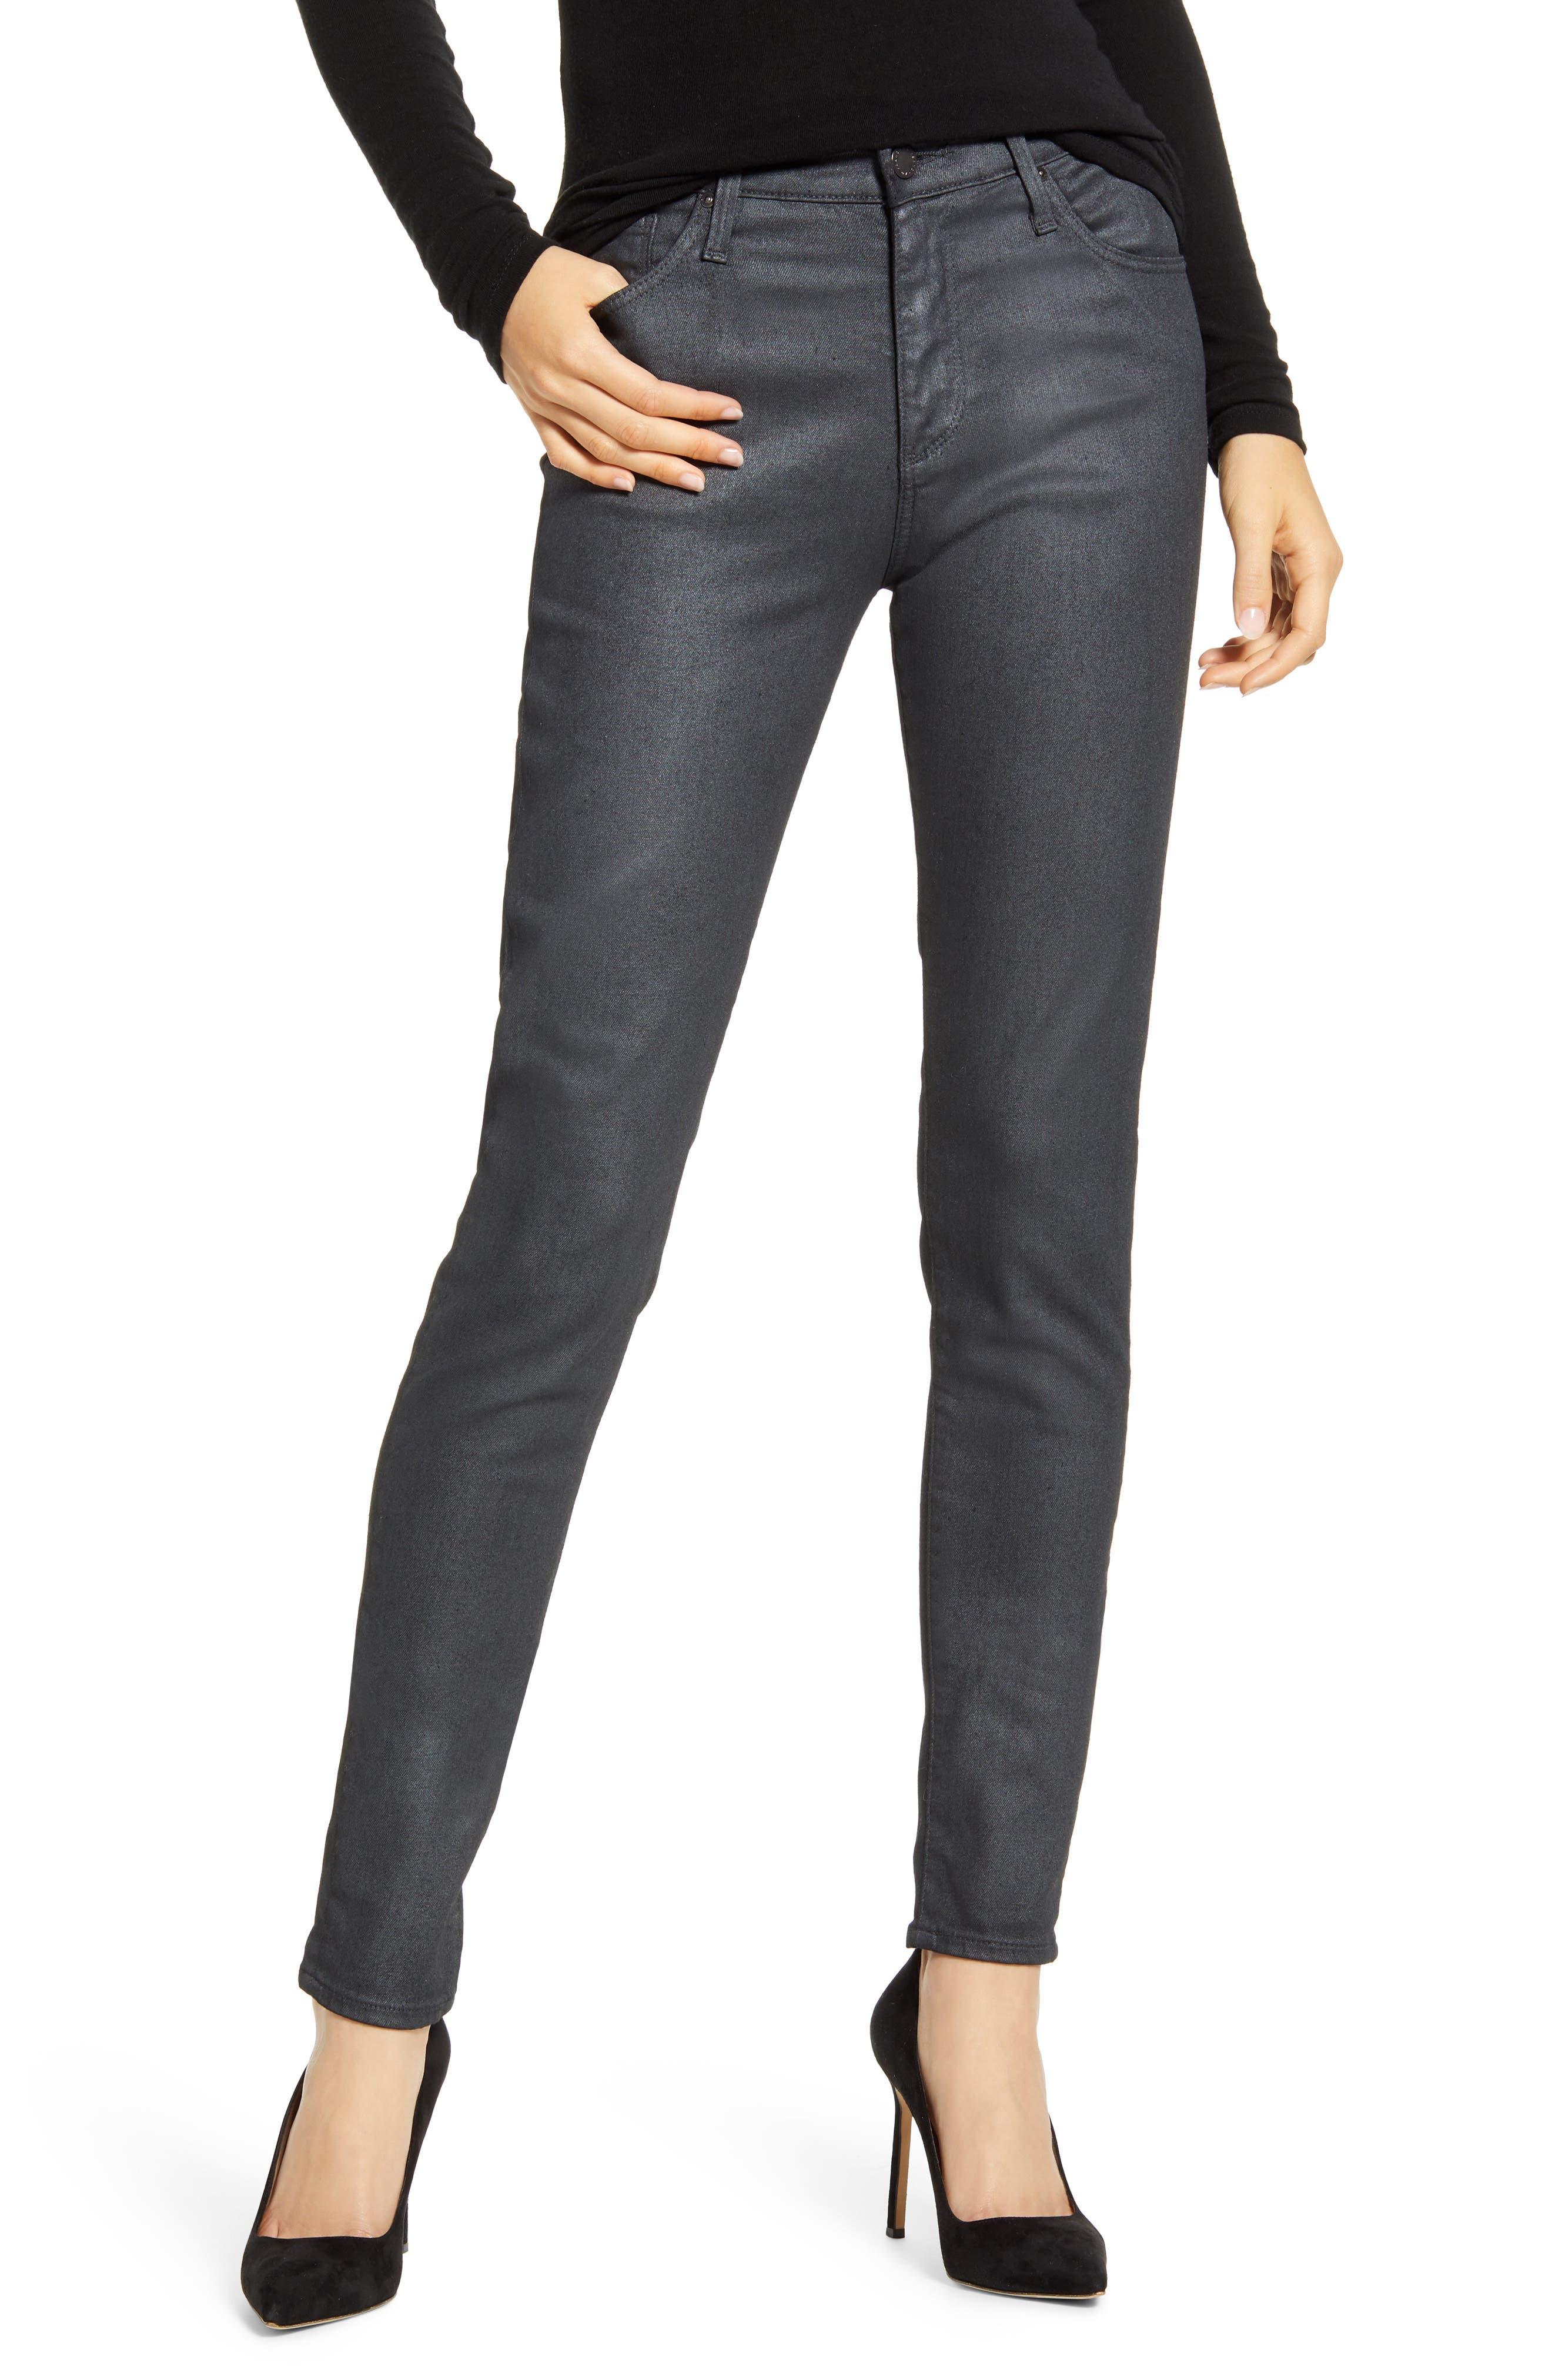 Women's AG The Farrah High Waist Skinny Jeans